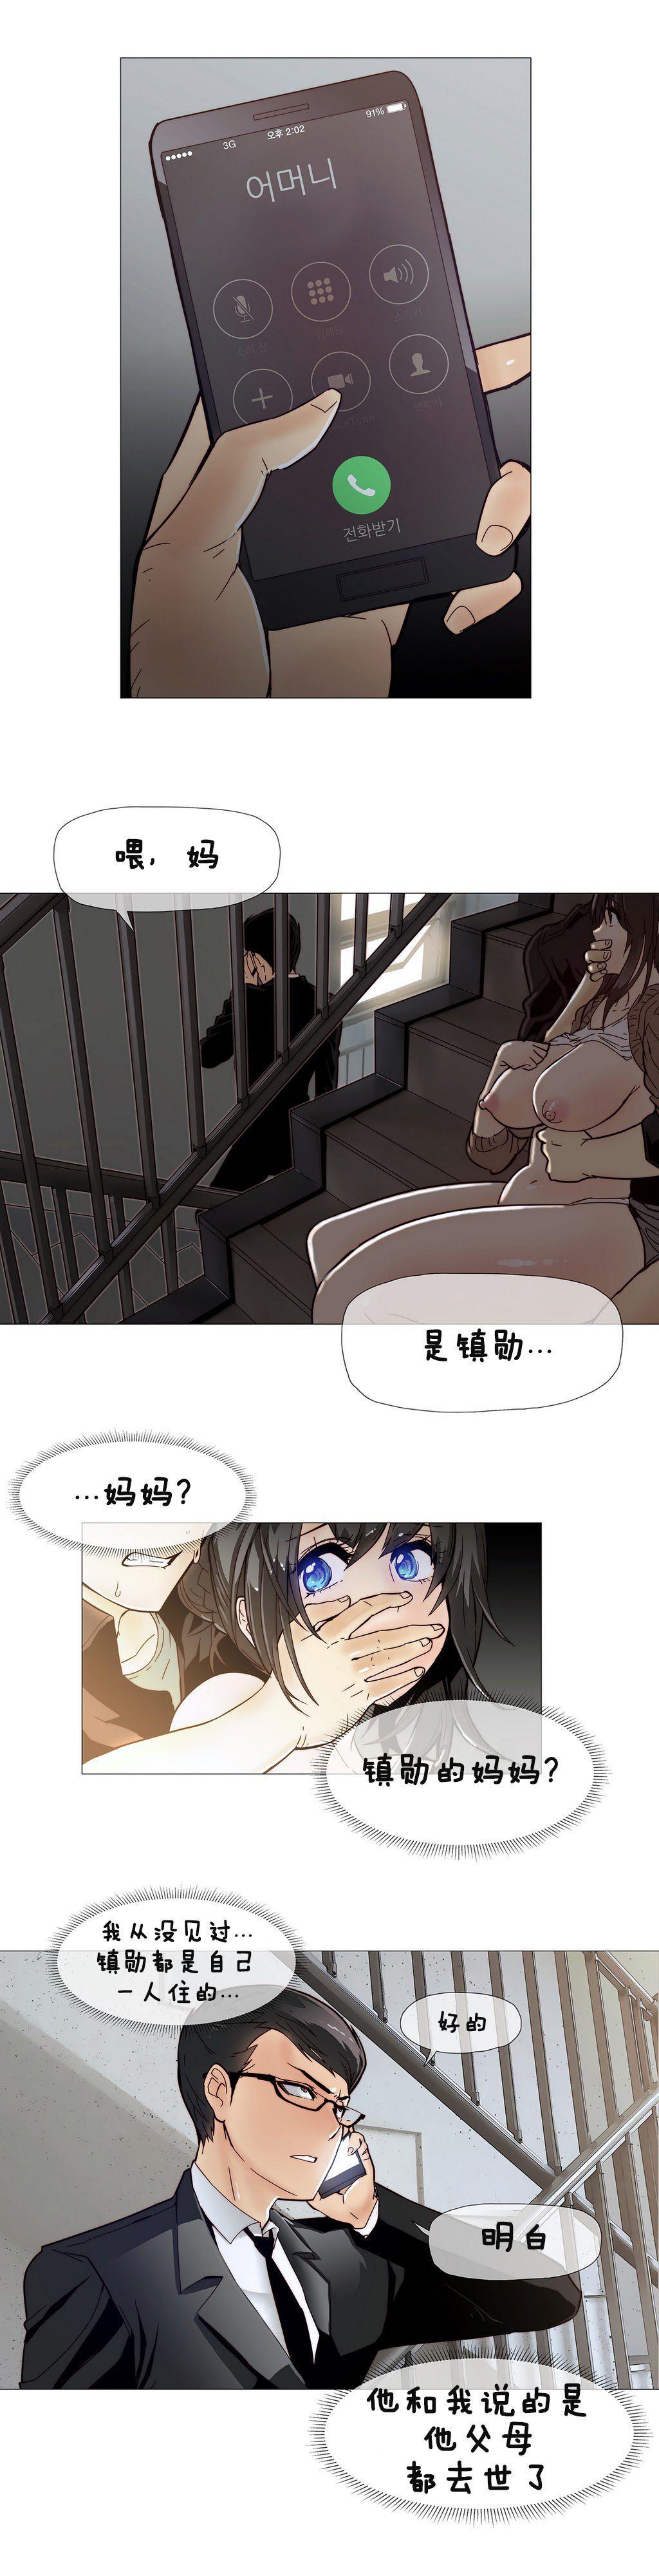 HouseHold Affairs 【卞赤鲤个人汉化】1~33话(持续更新中) 148